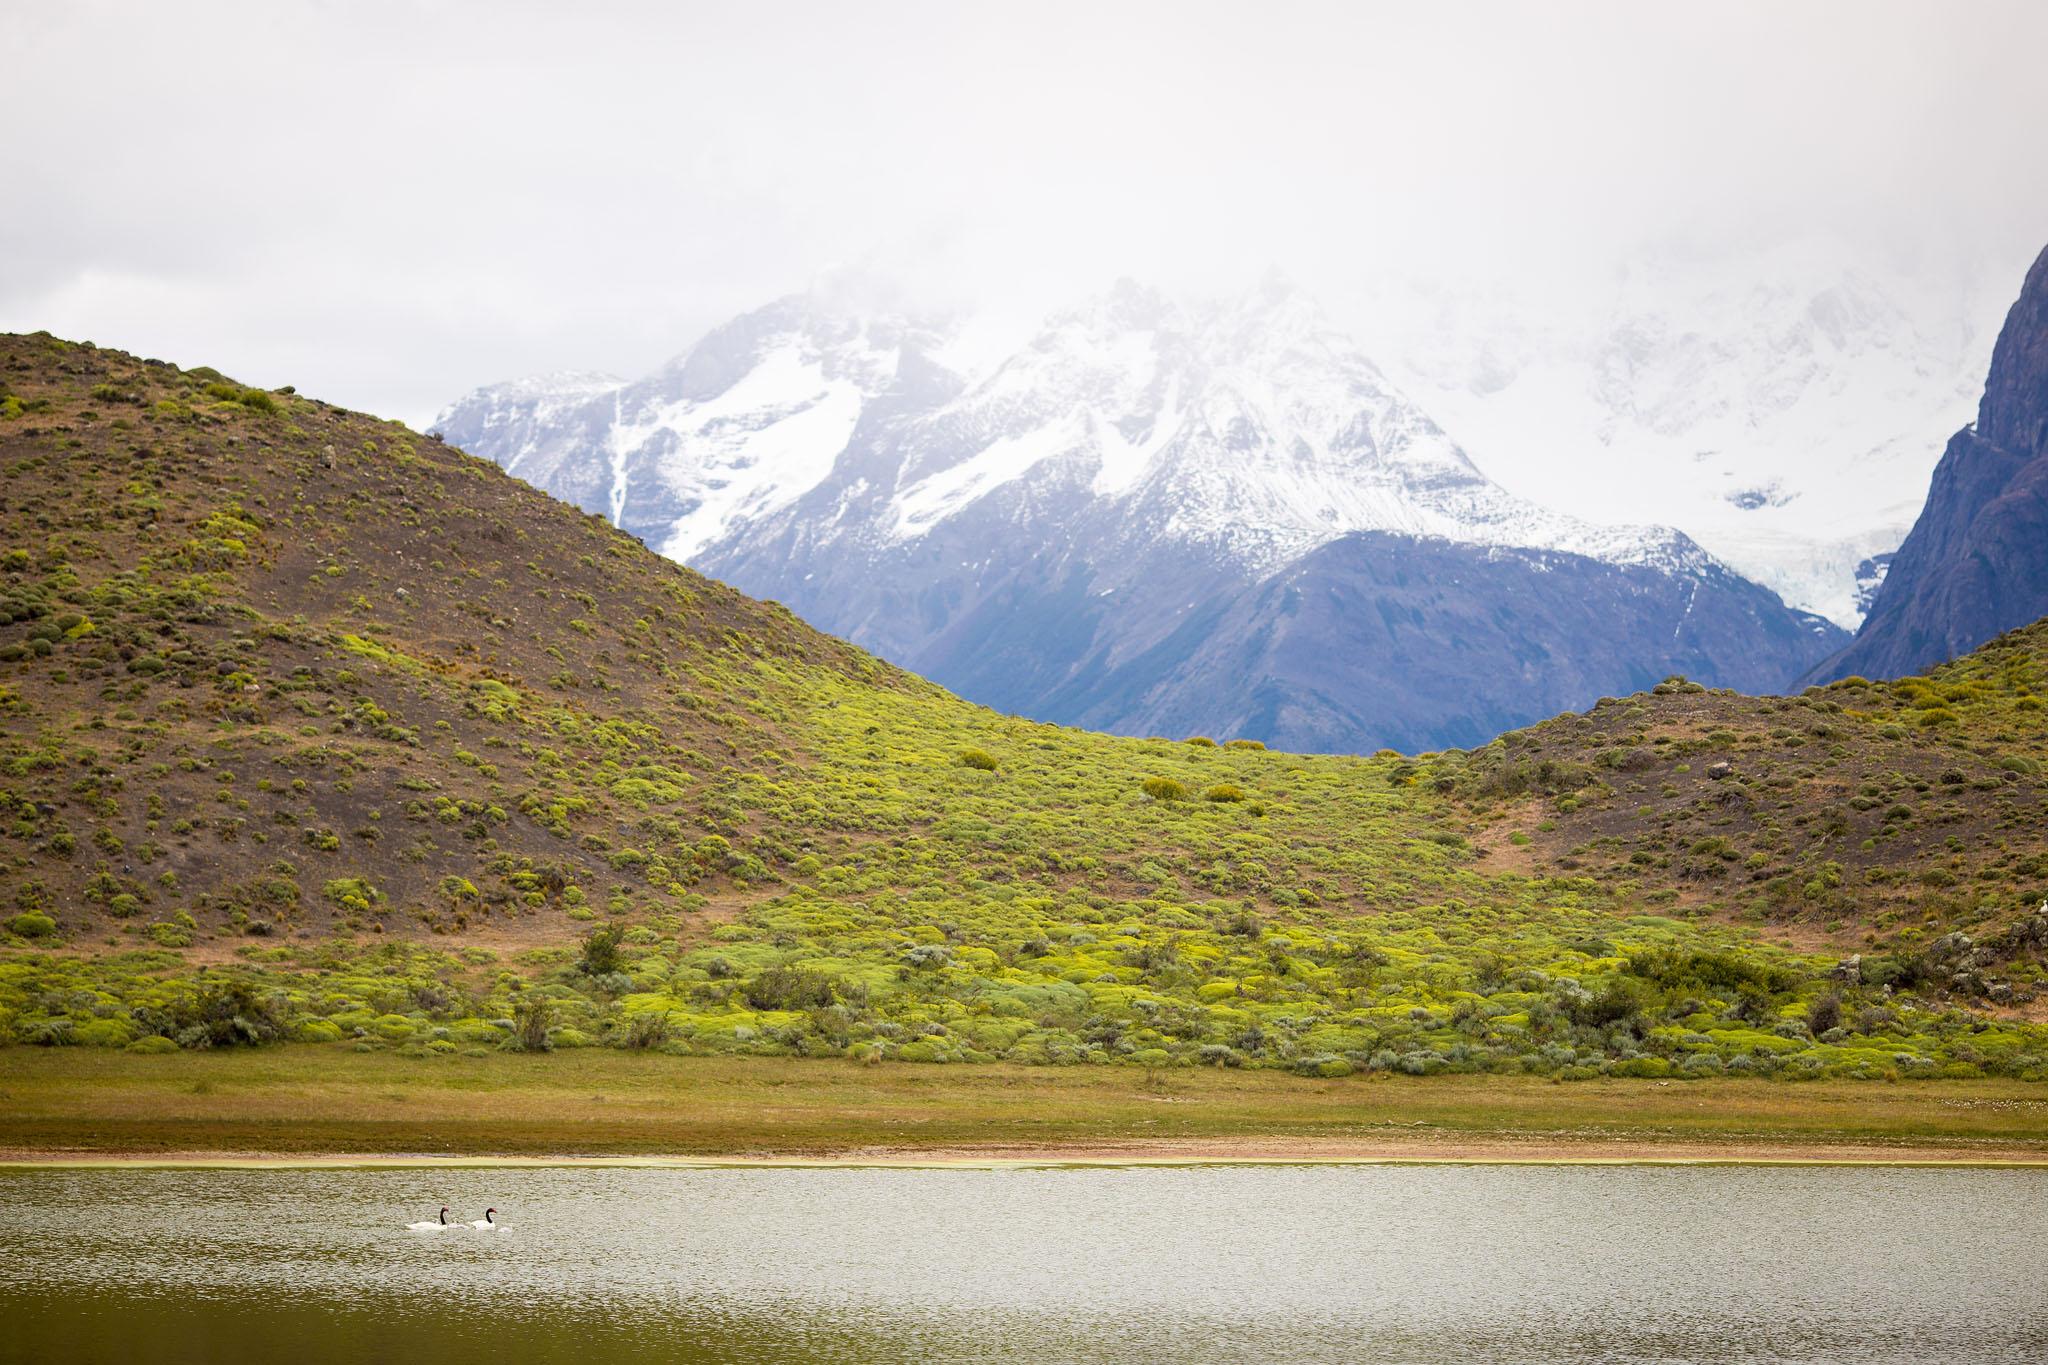 Wedding-Travellers-Overlanding-Destination-Wedding-Chile-Torres-del-Paine-black-necked-swan-laguna-lake-amarga